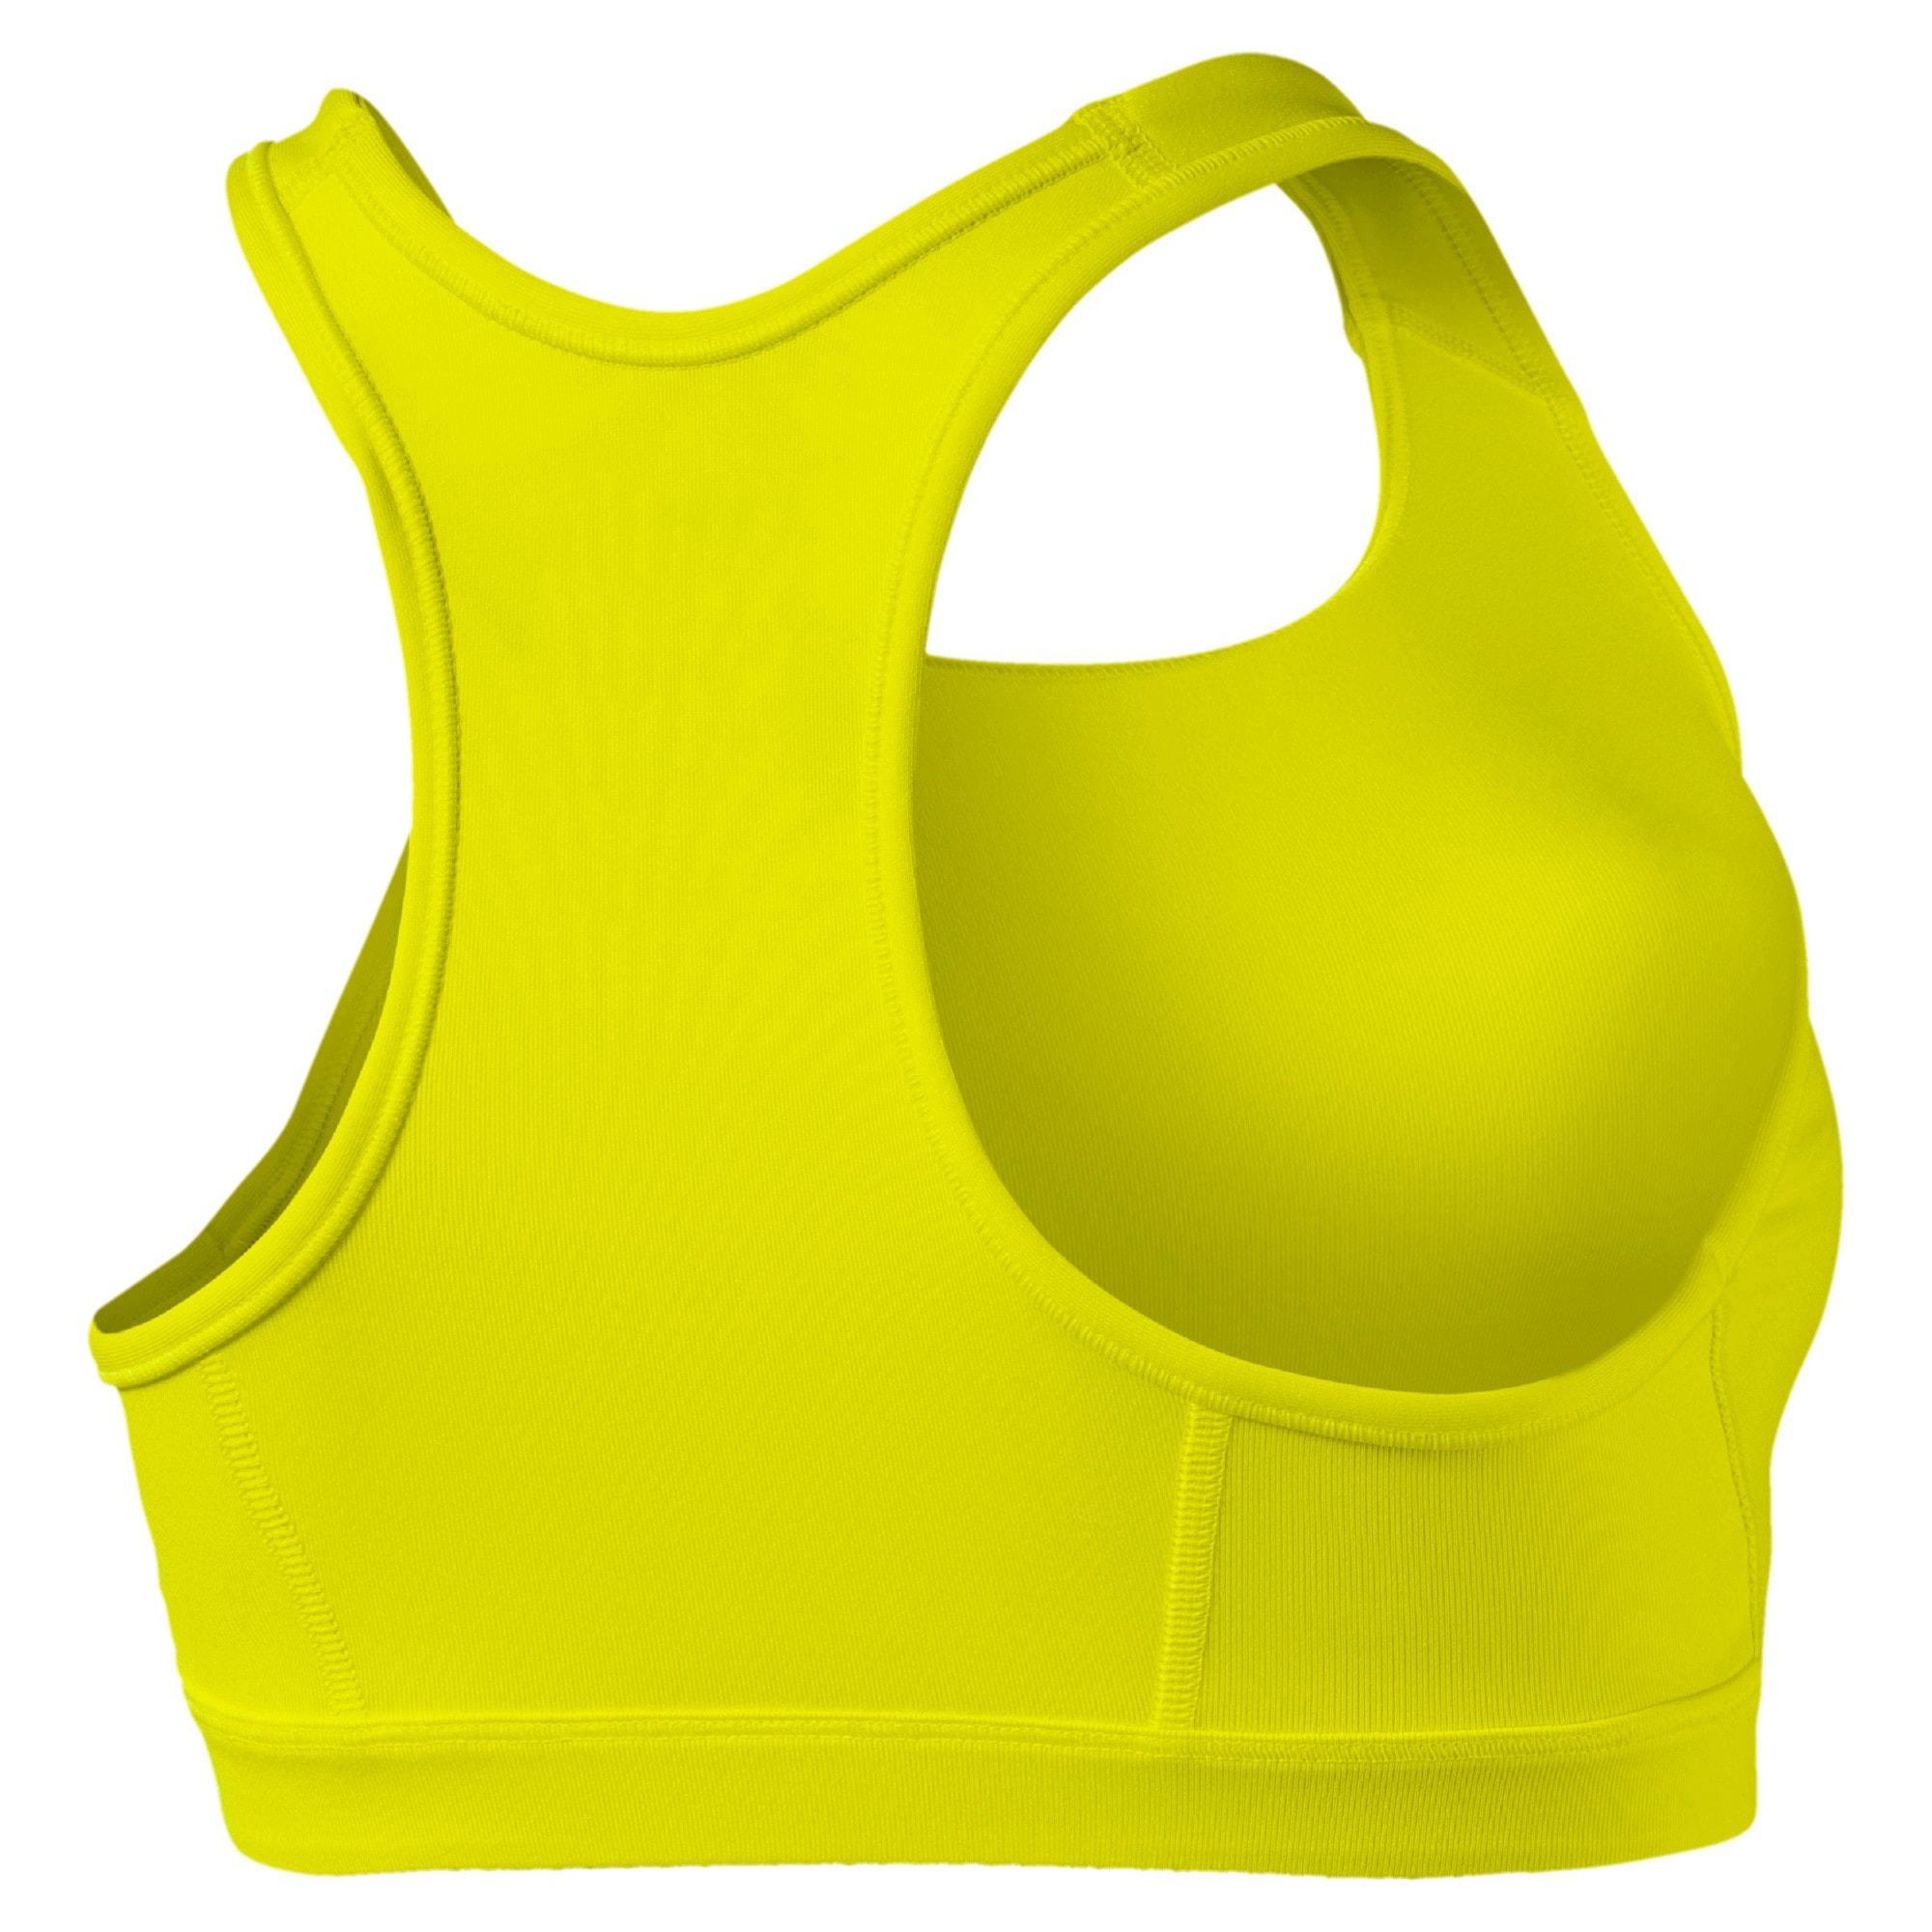 Thumbnail 5 of 4Keeps Mid Impact Women's Bra Top, Yellow Alert, medium